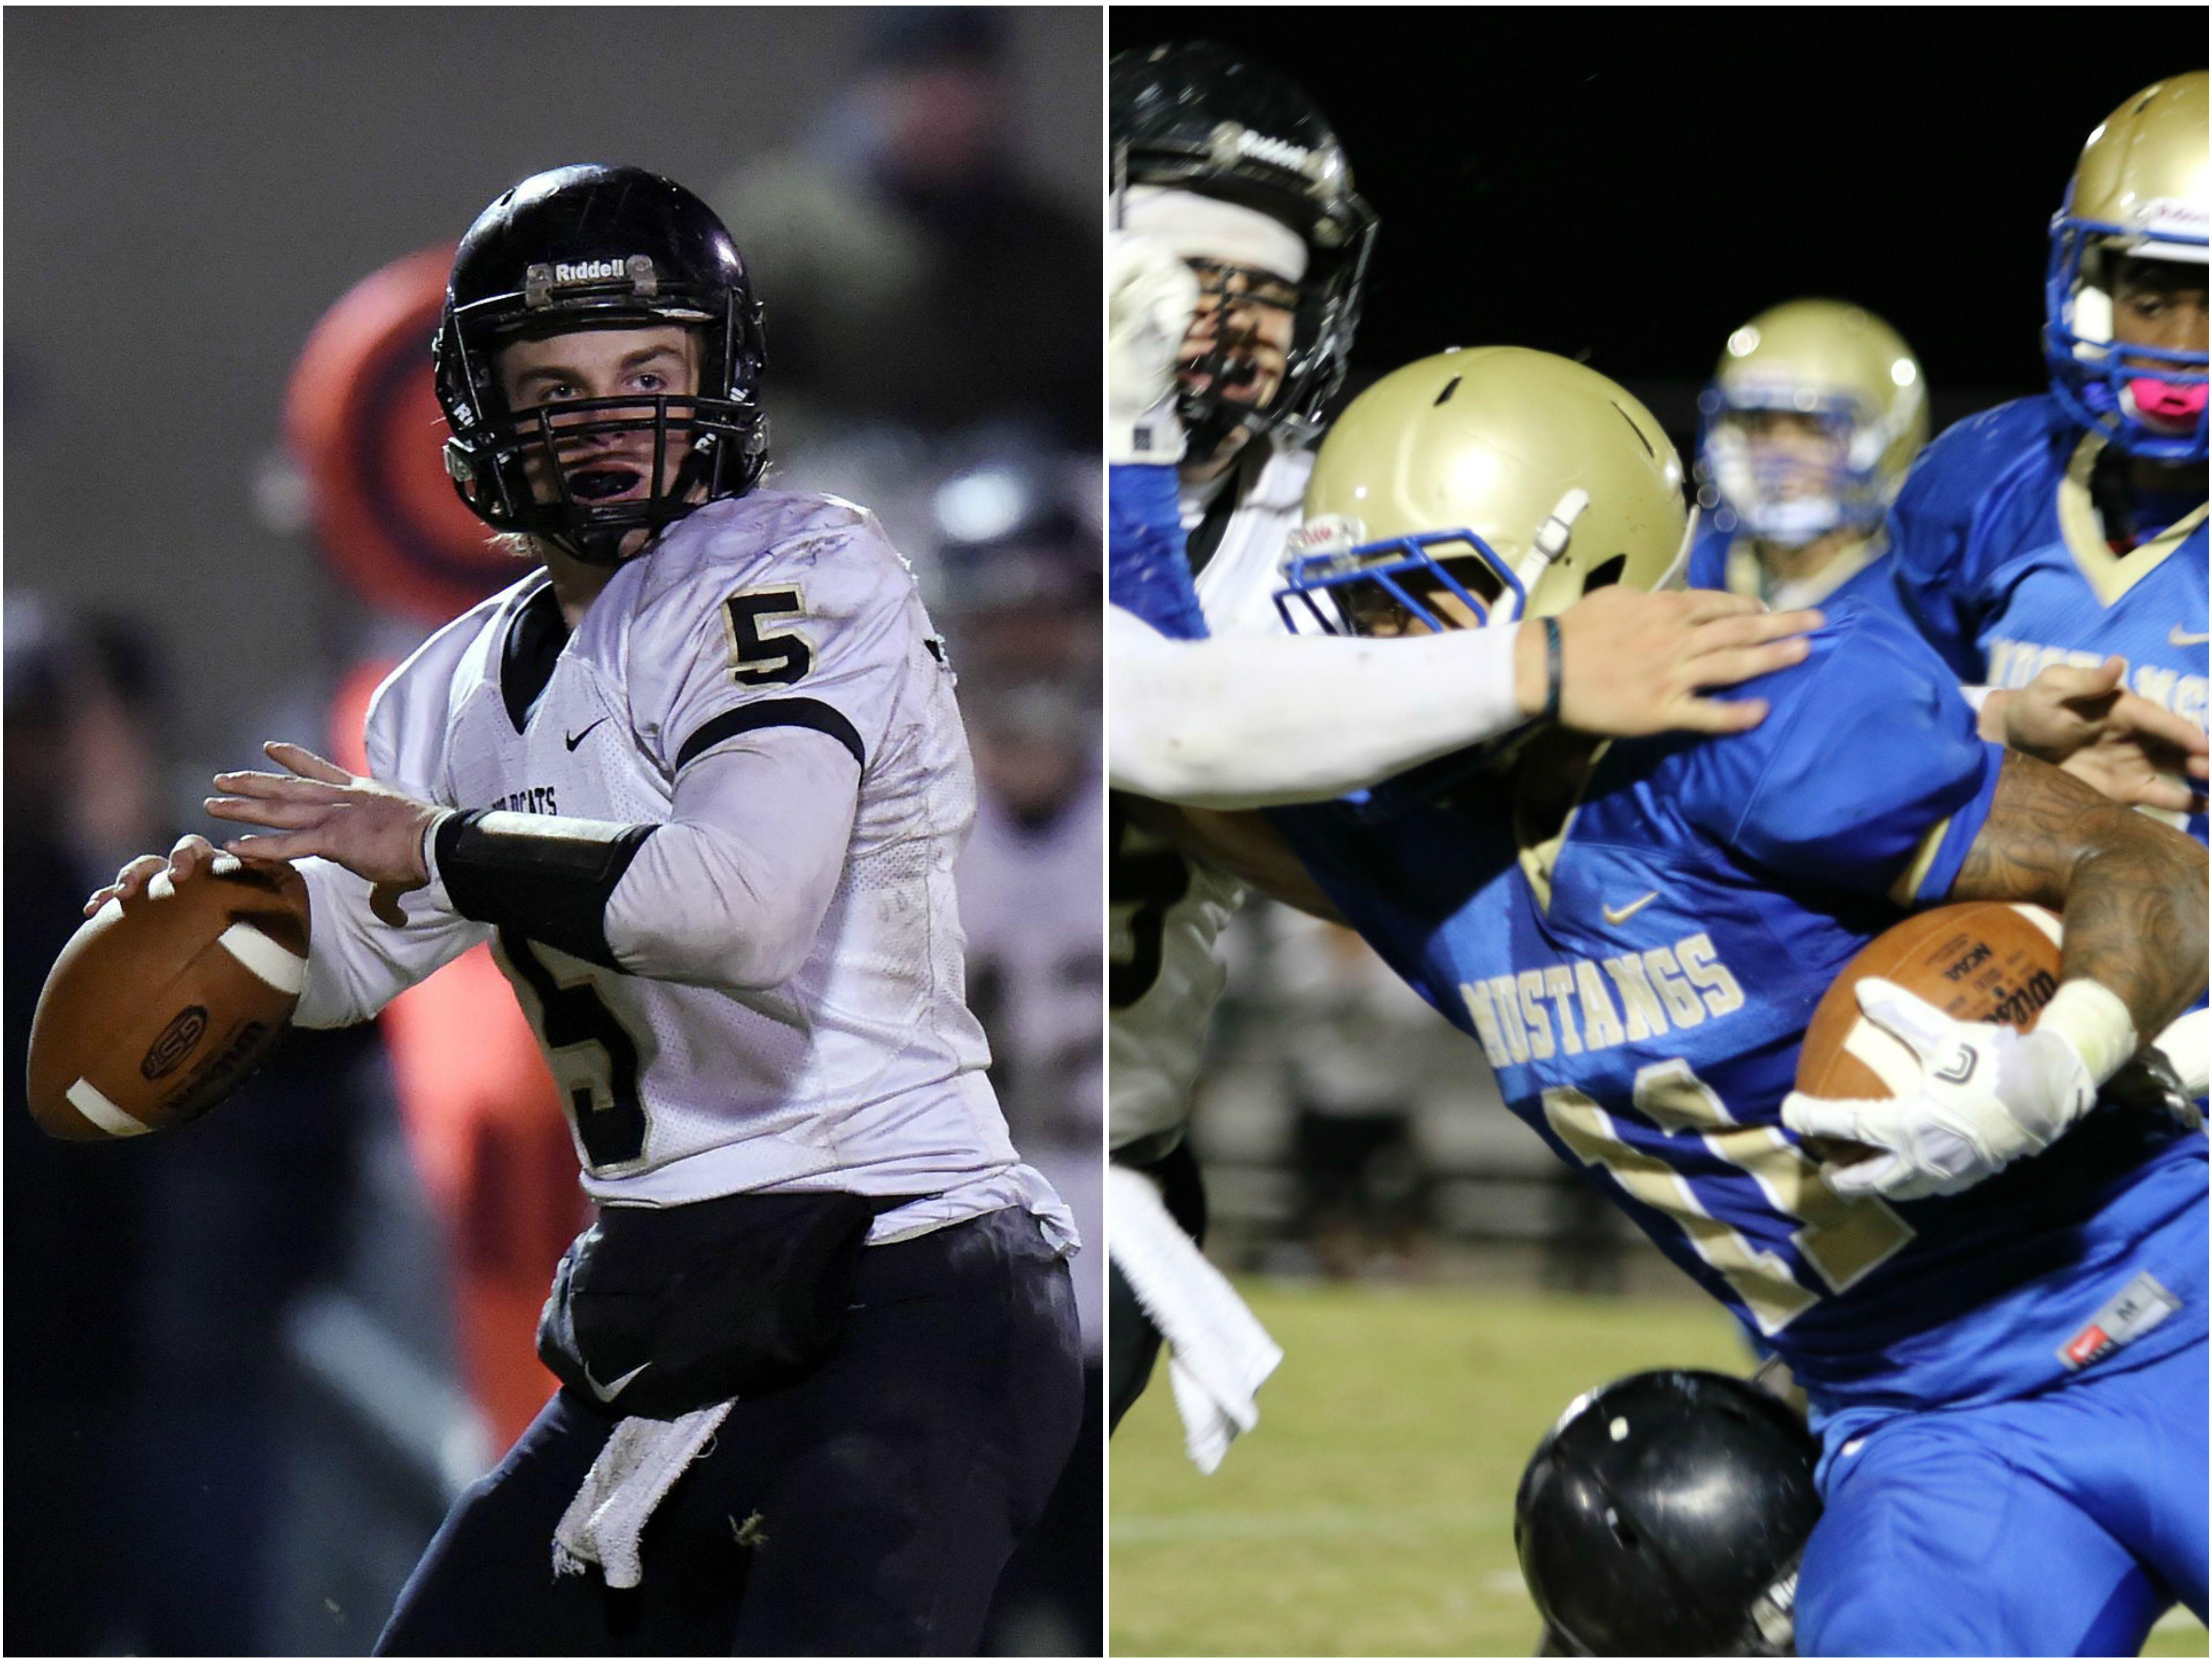 Wayne County quarterback Preston Rice (left) and Huntgindon's Dylan Johnson (right)